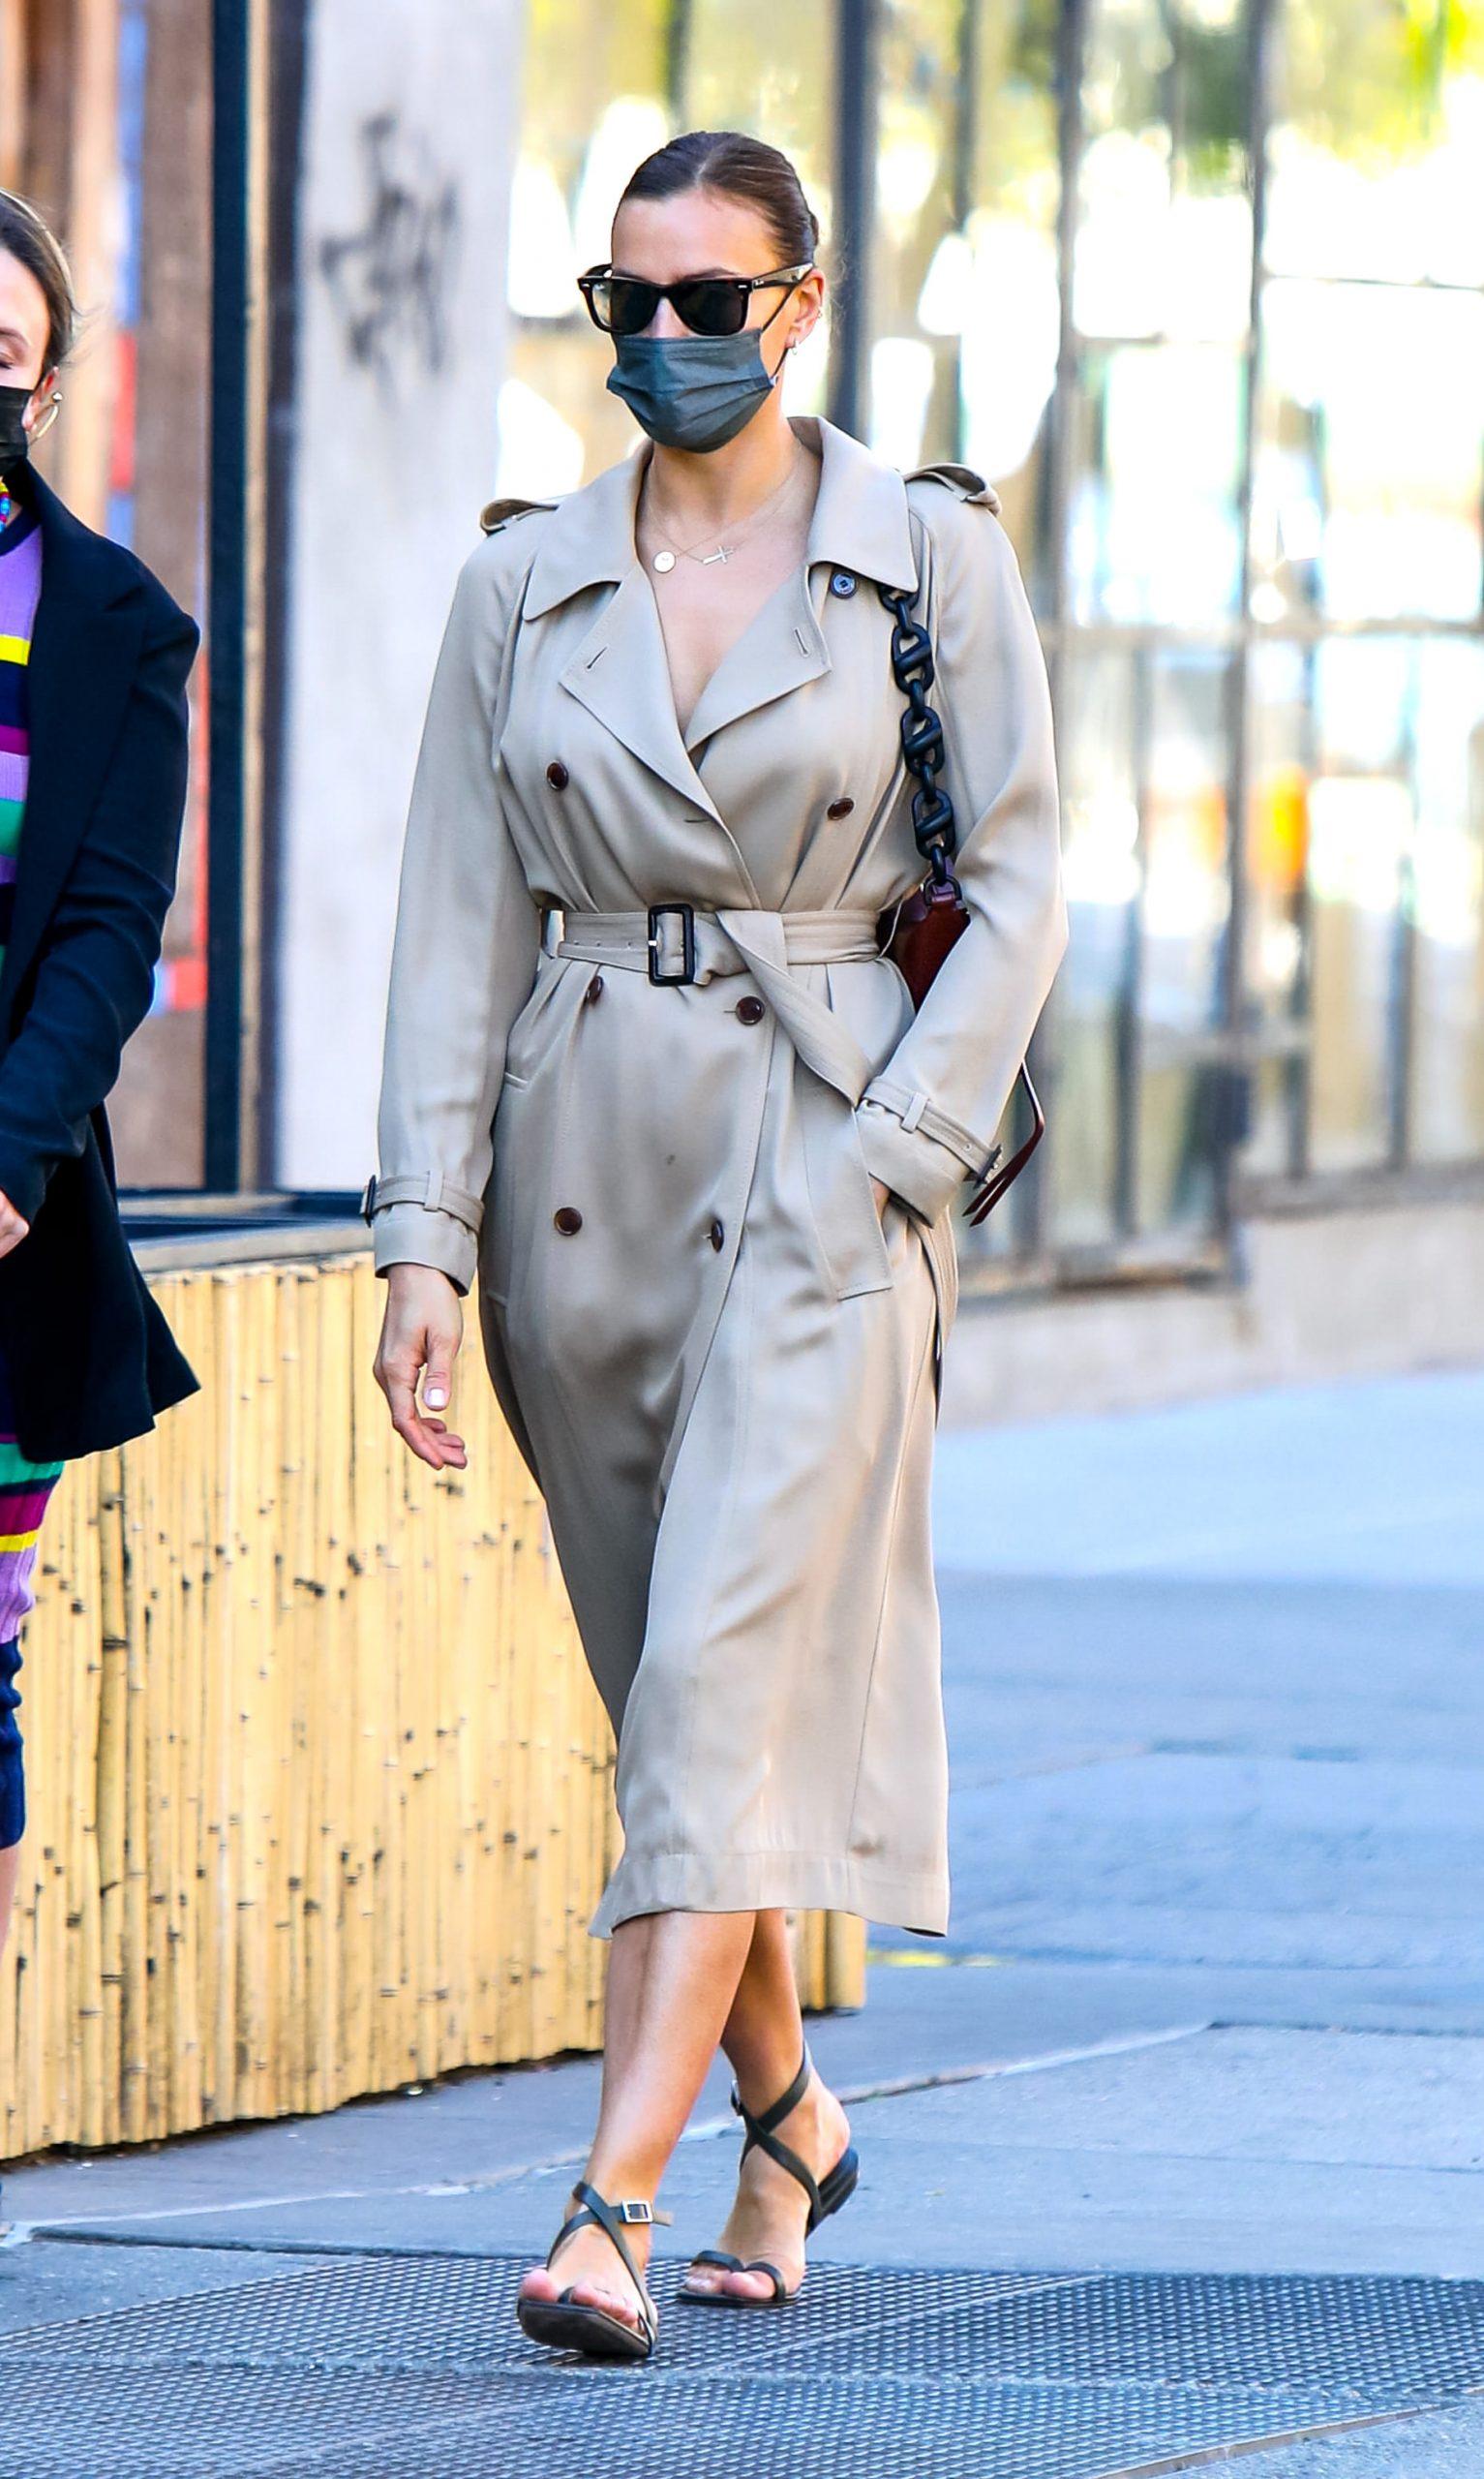 Irina Shayk runs errands in in Downtown, Manhattan